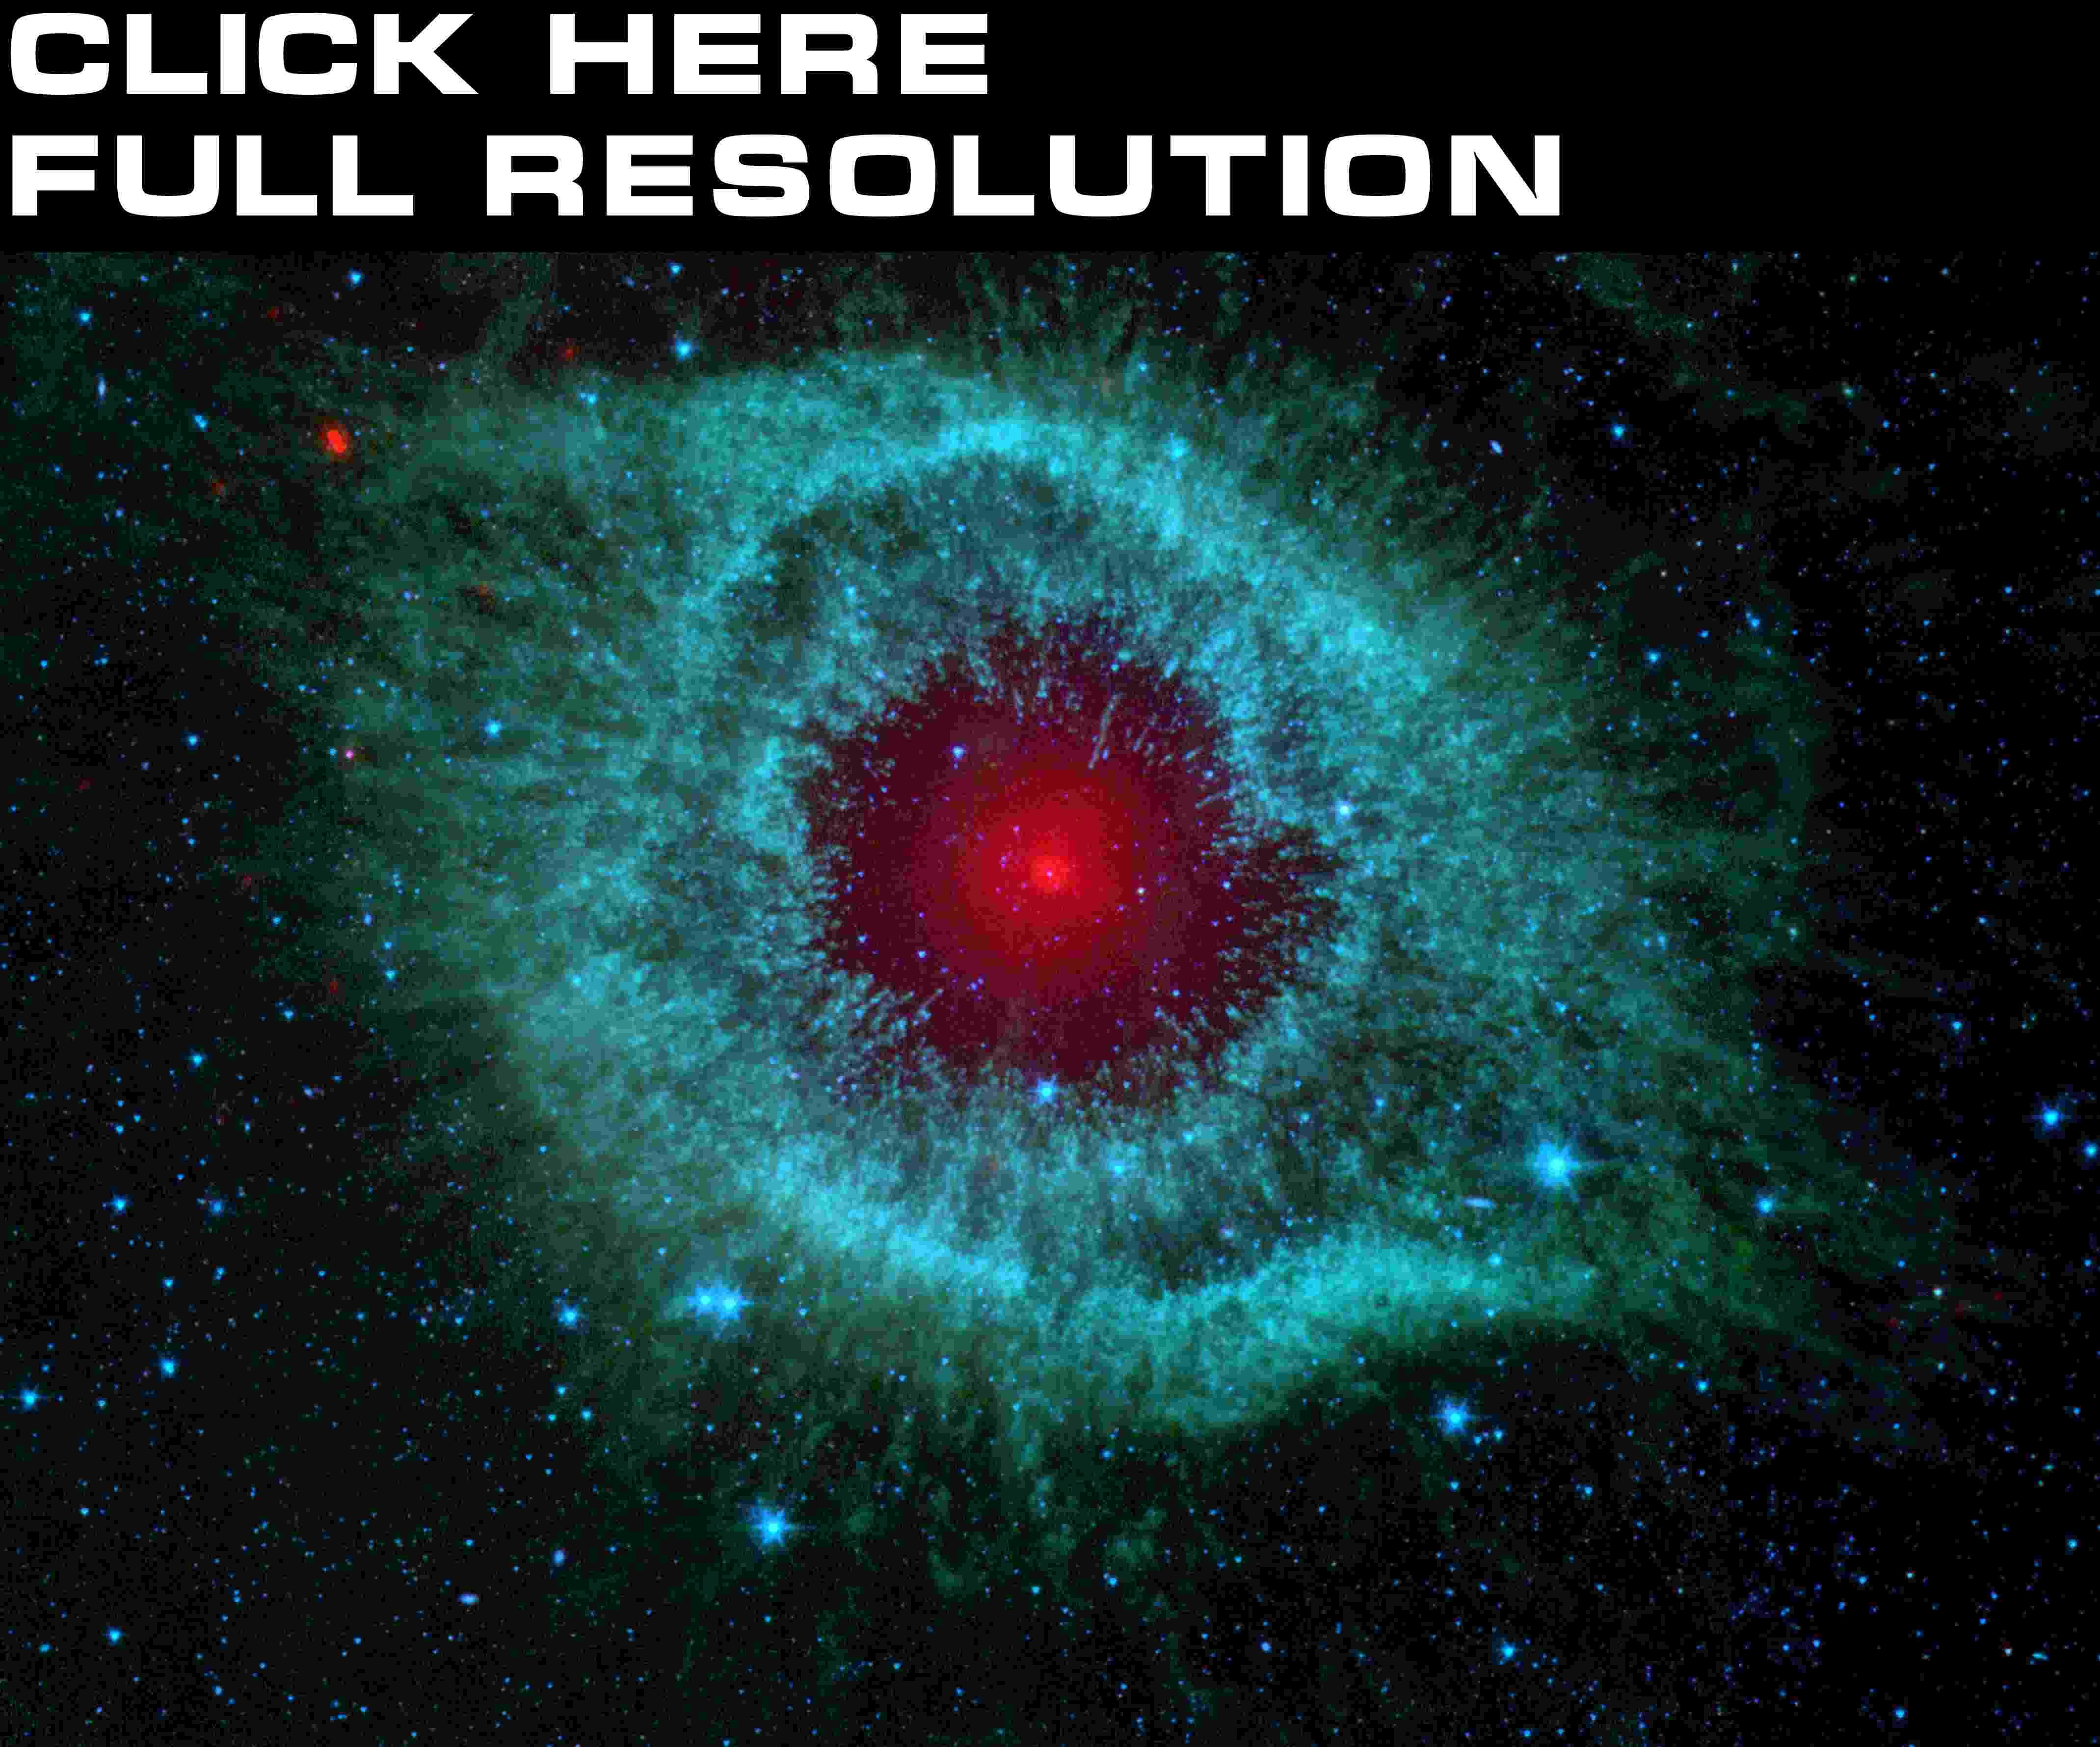 Full High Resolution HD Background